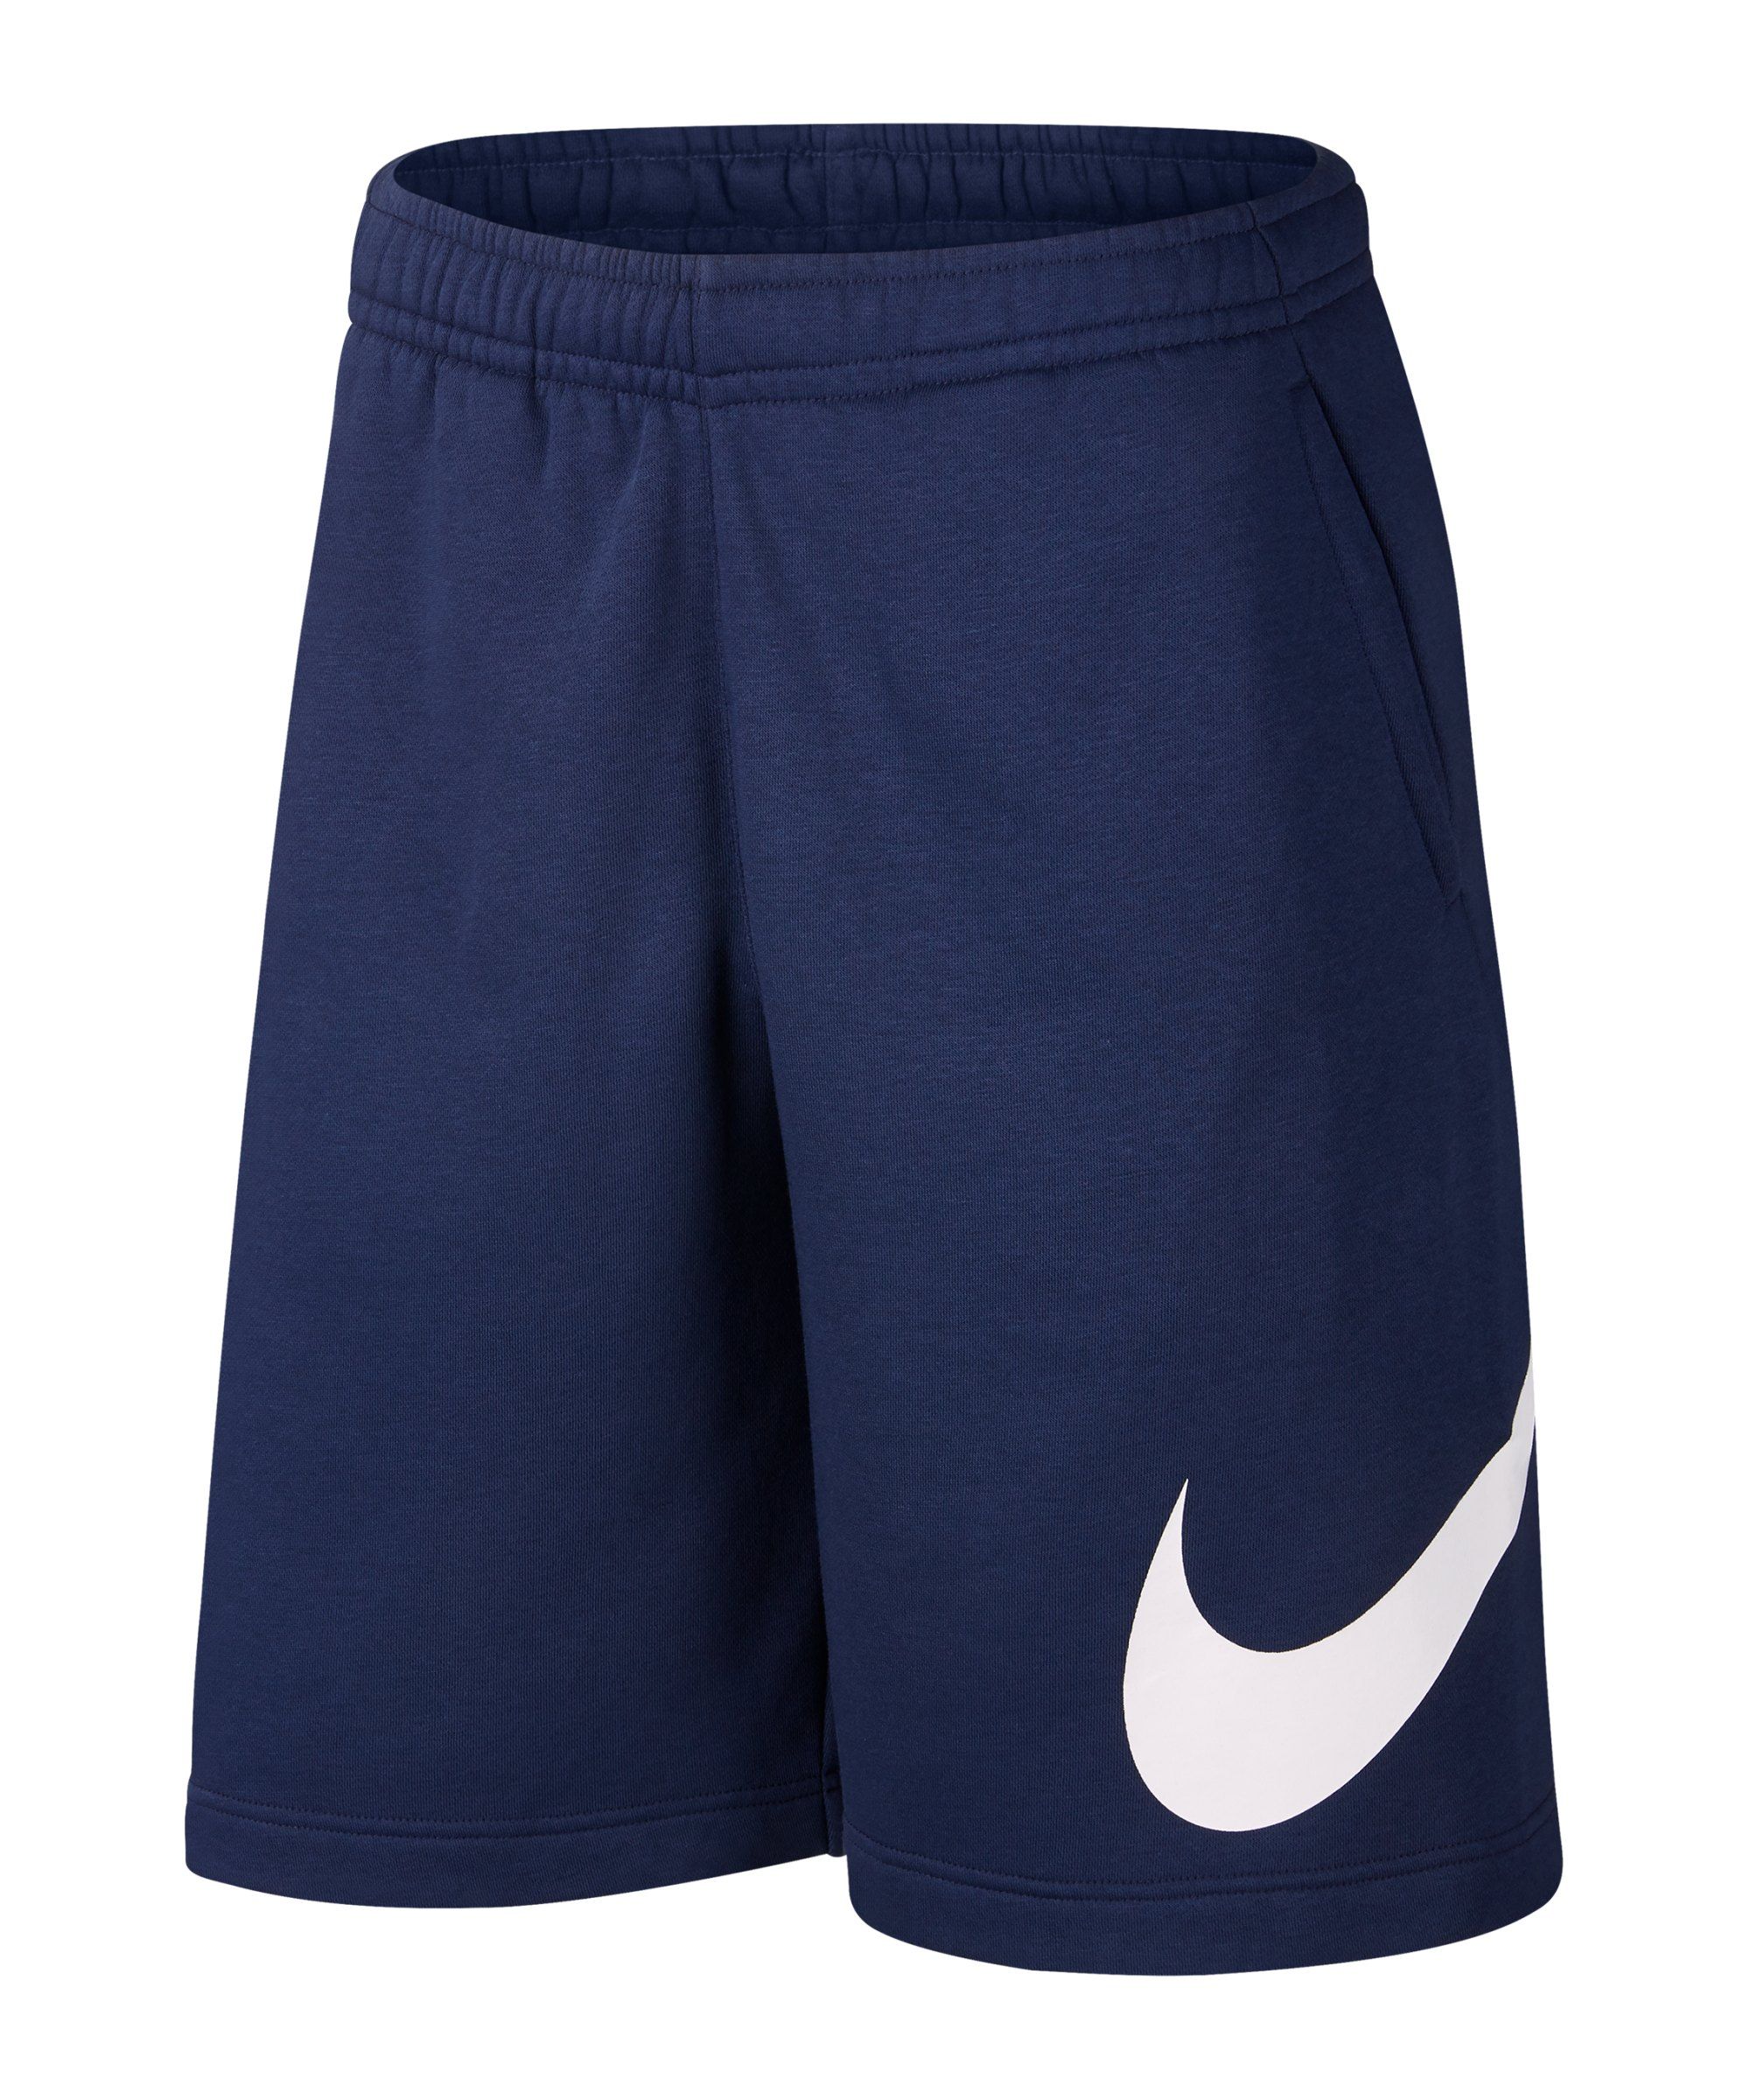 Nike Club Graphic Short Blau Weiss F410 - blau